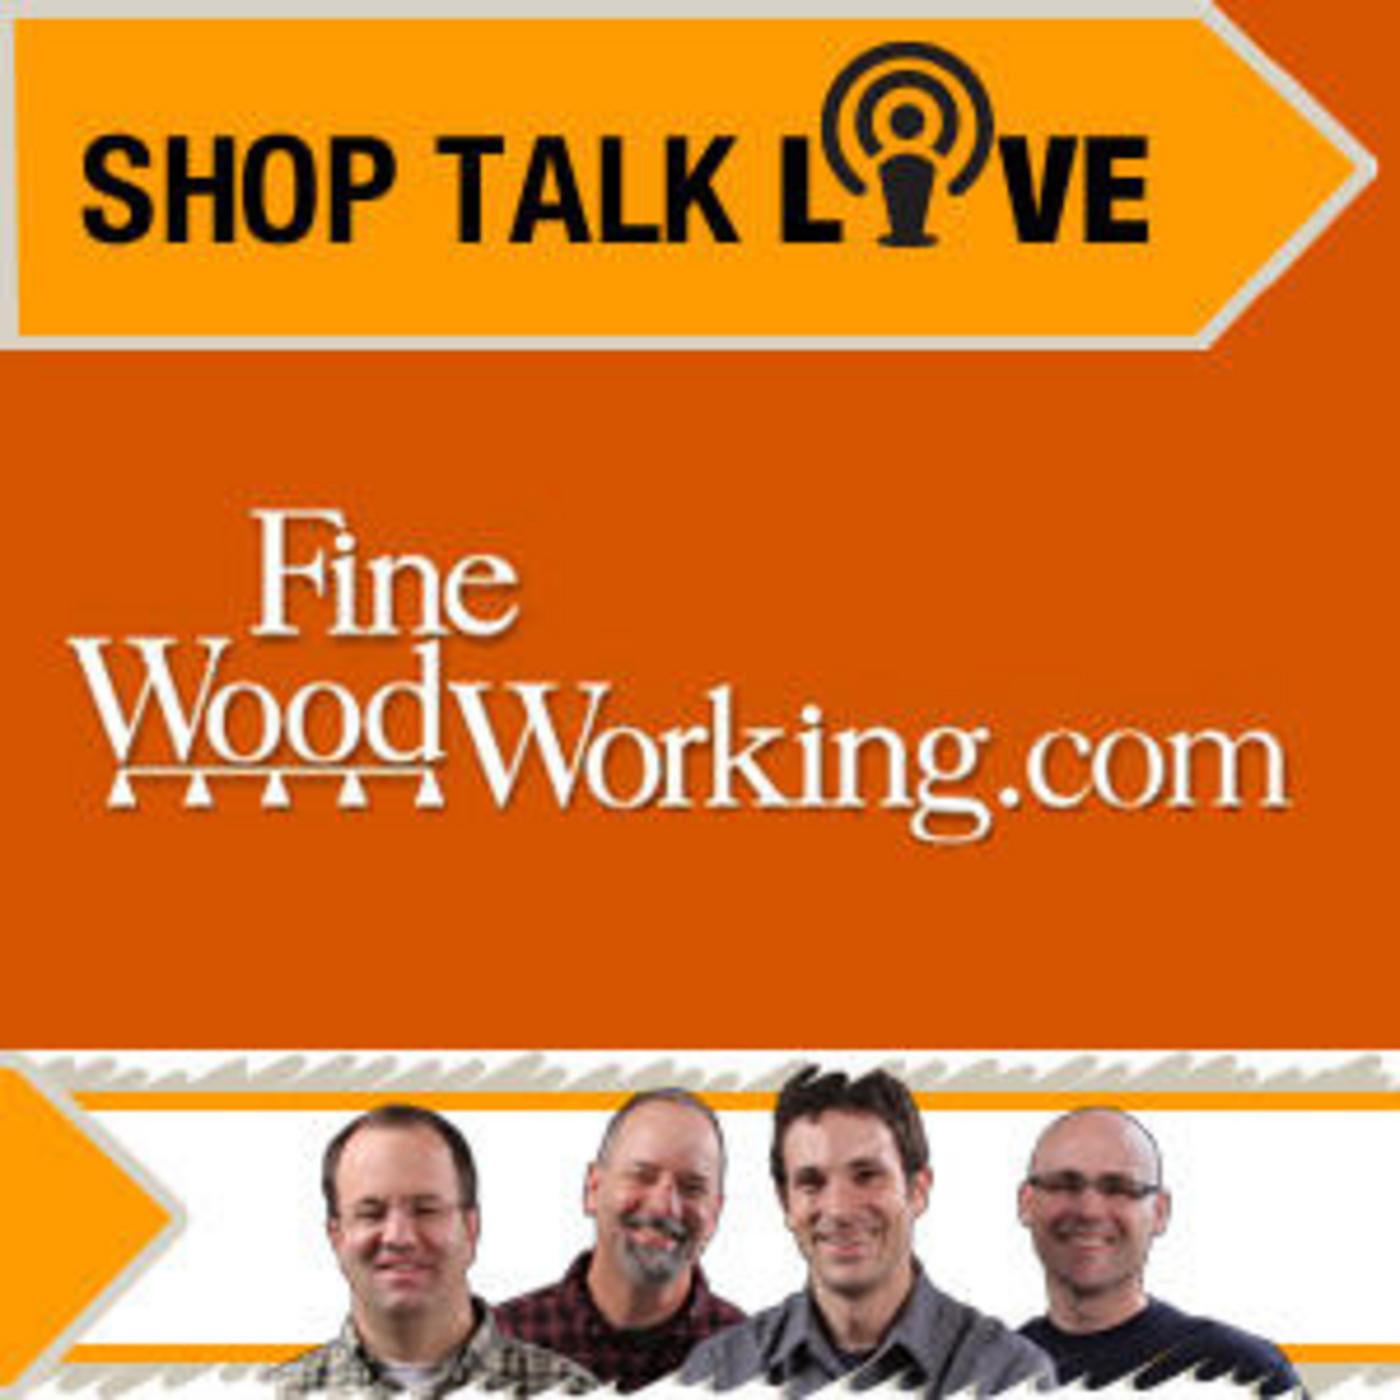 Shop Talk Live 38: Brian Boggs' Brainy Shop Machinery